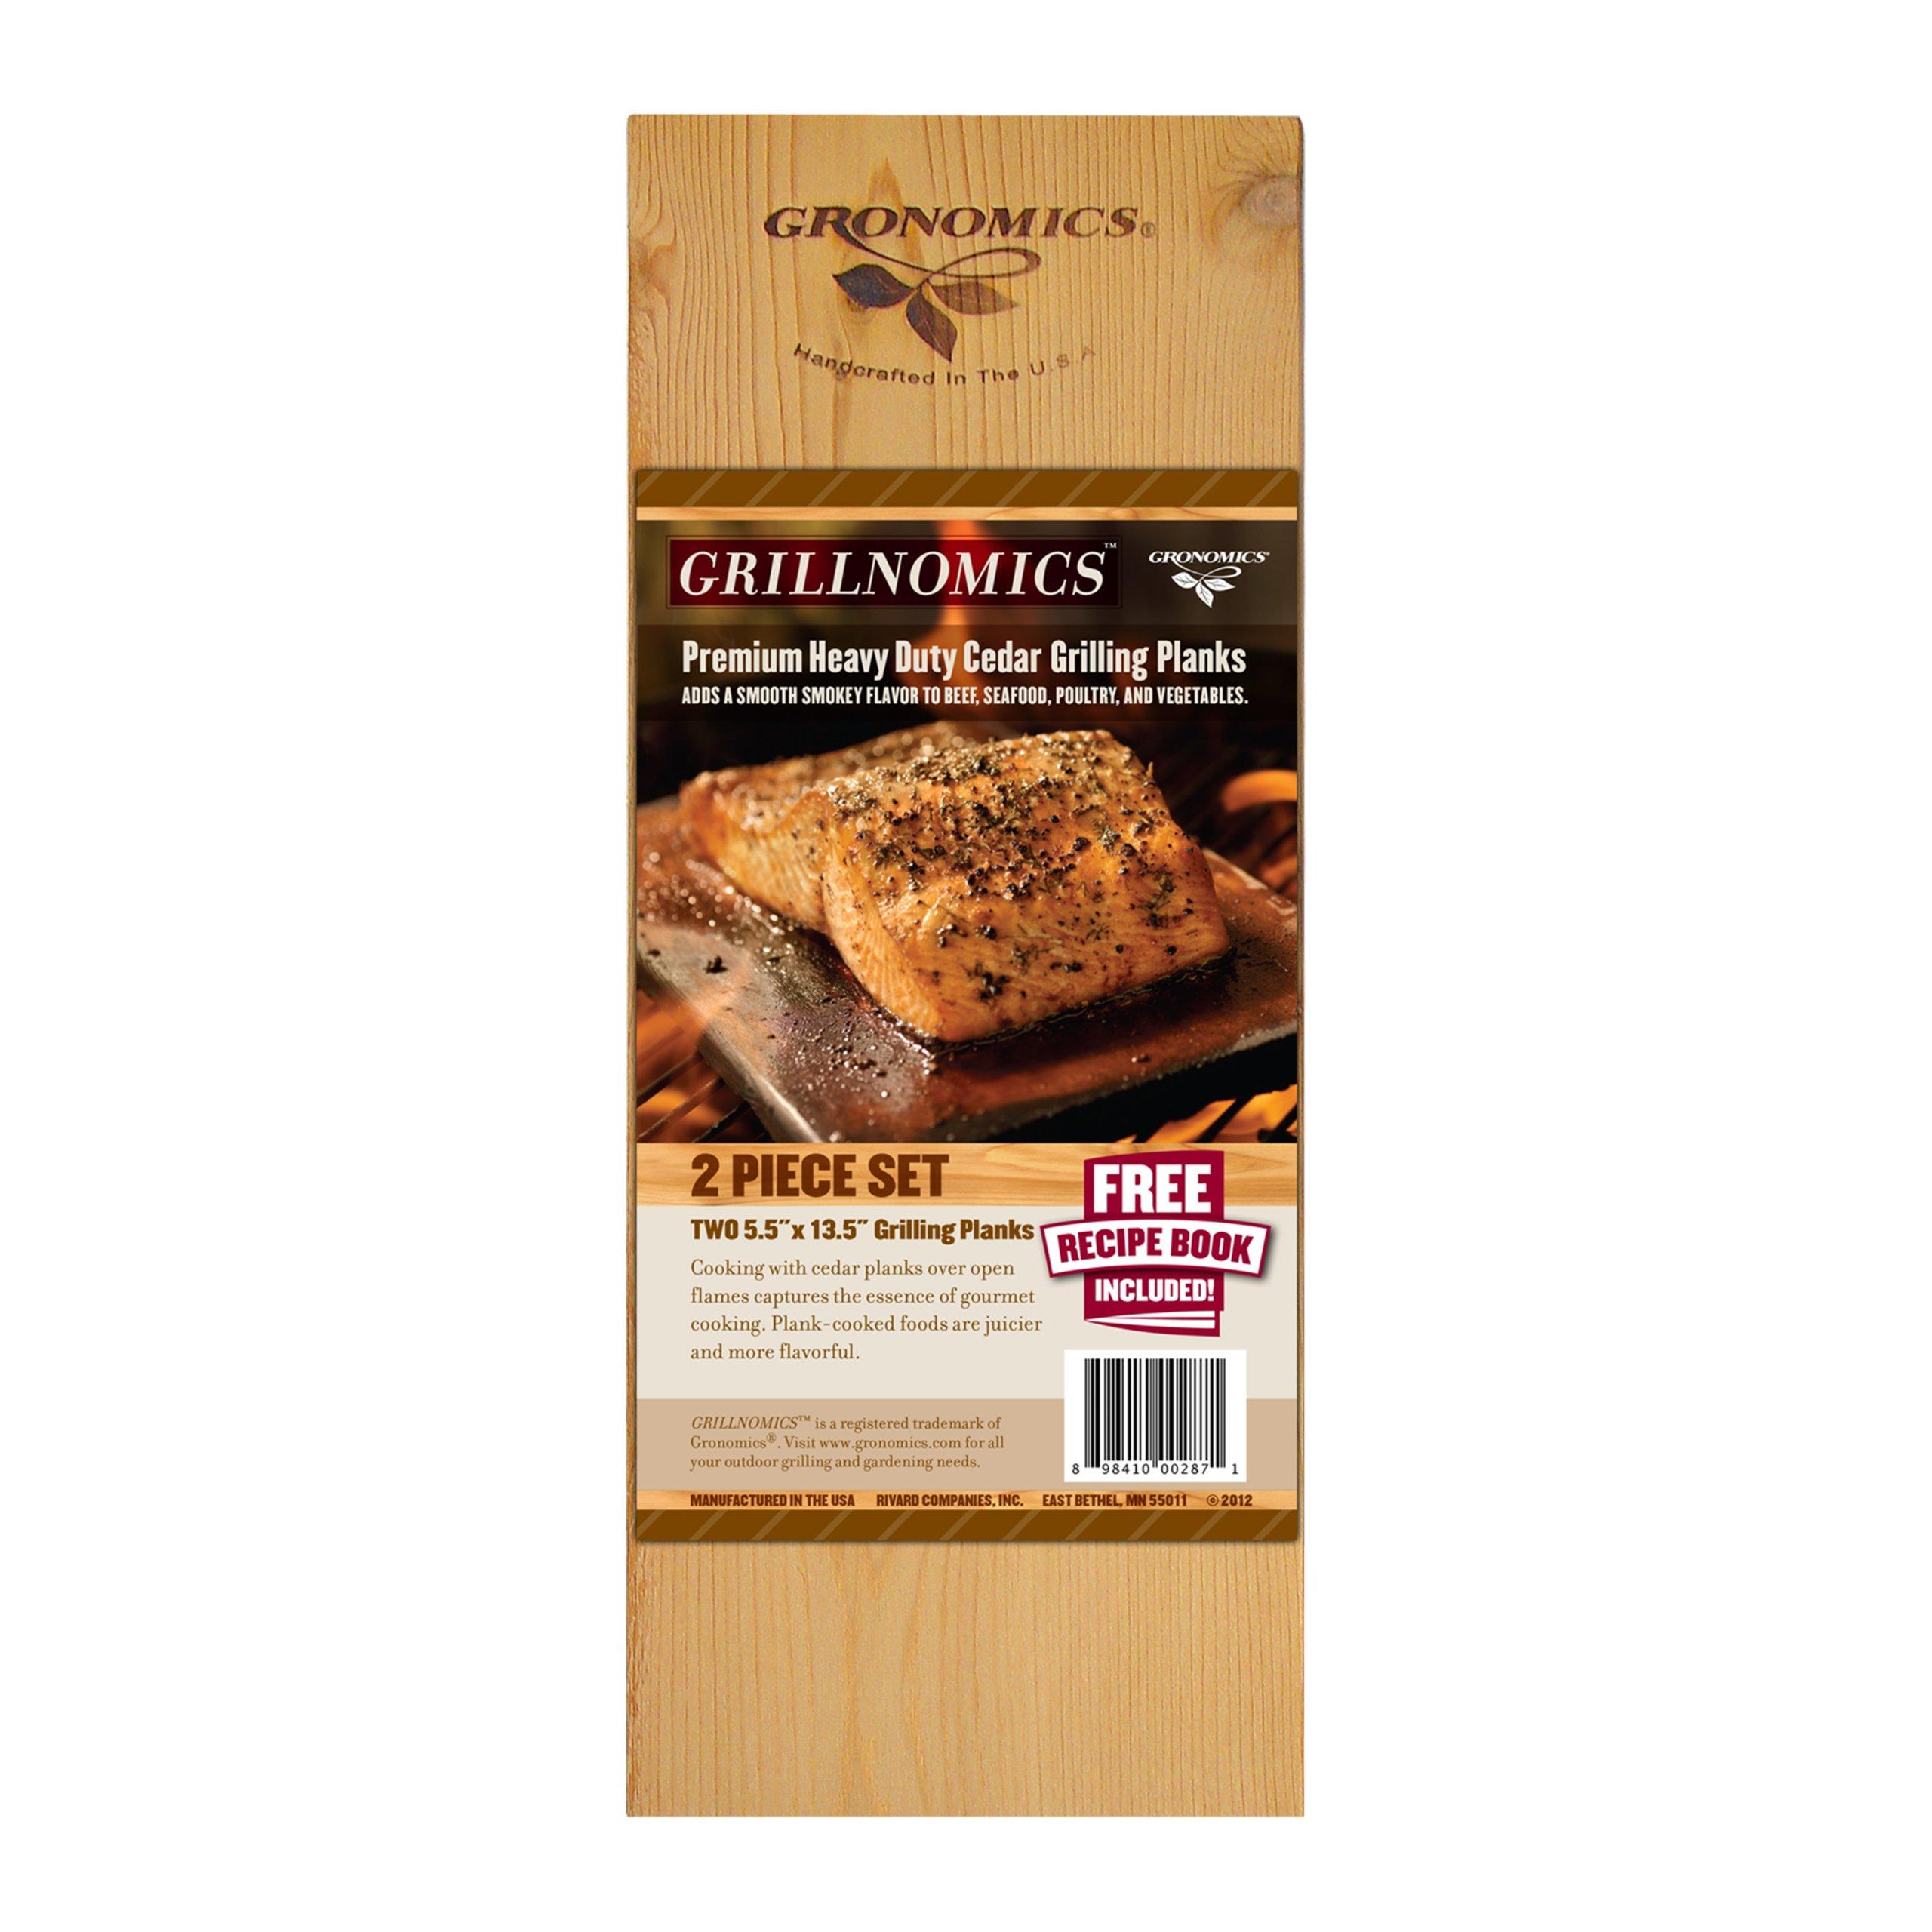 Gronomics GCP 5.5-13.5 2-Pack Grillnomics Cedar Grilling Planks